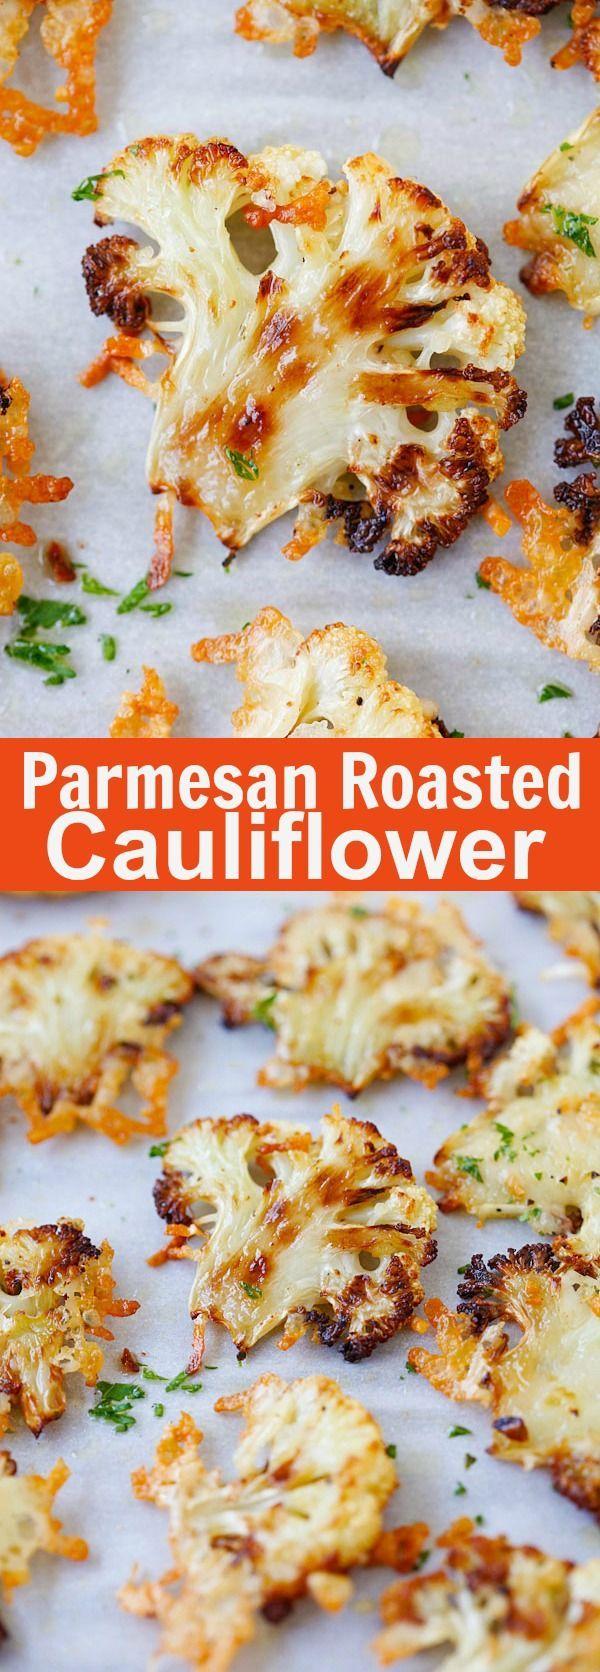 Roasted Cauliflower - Cauliflower Recipes - Rasa Malaysia